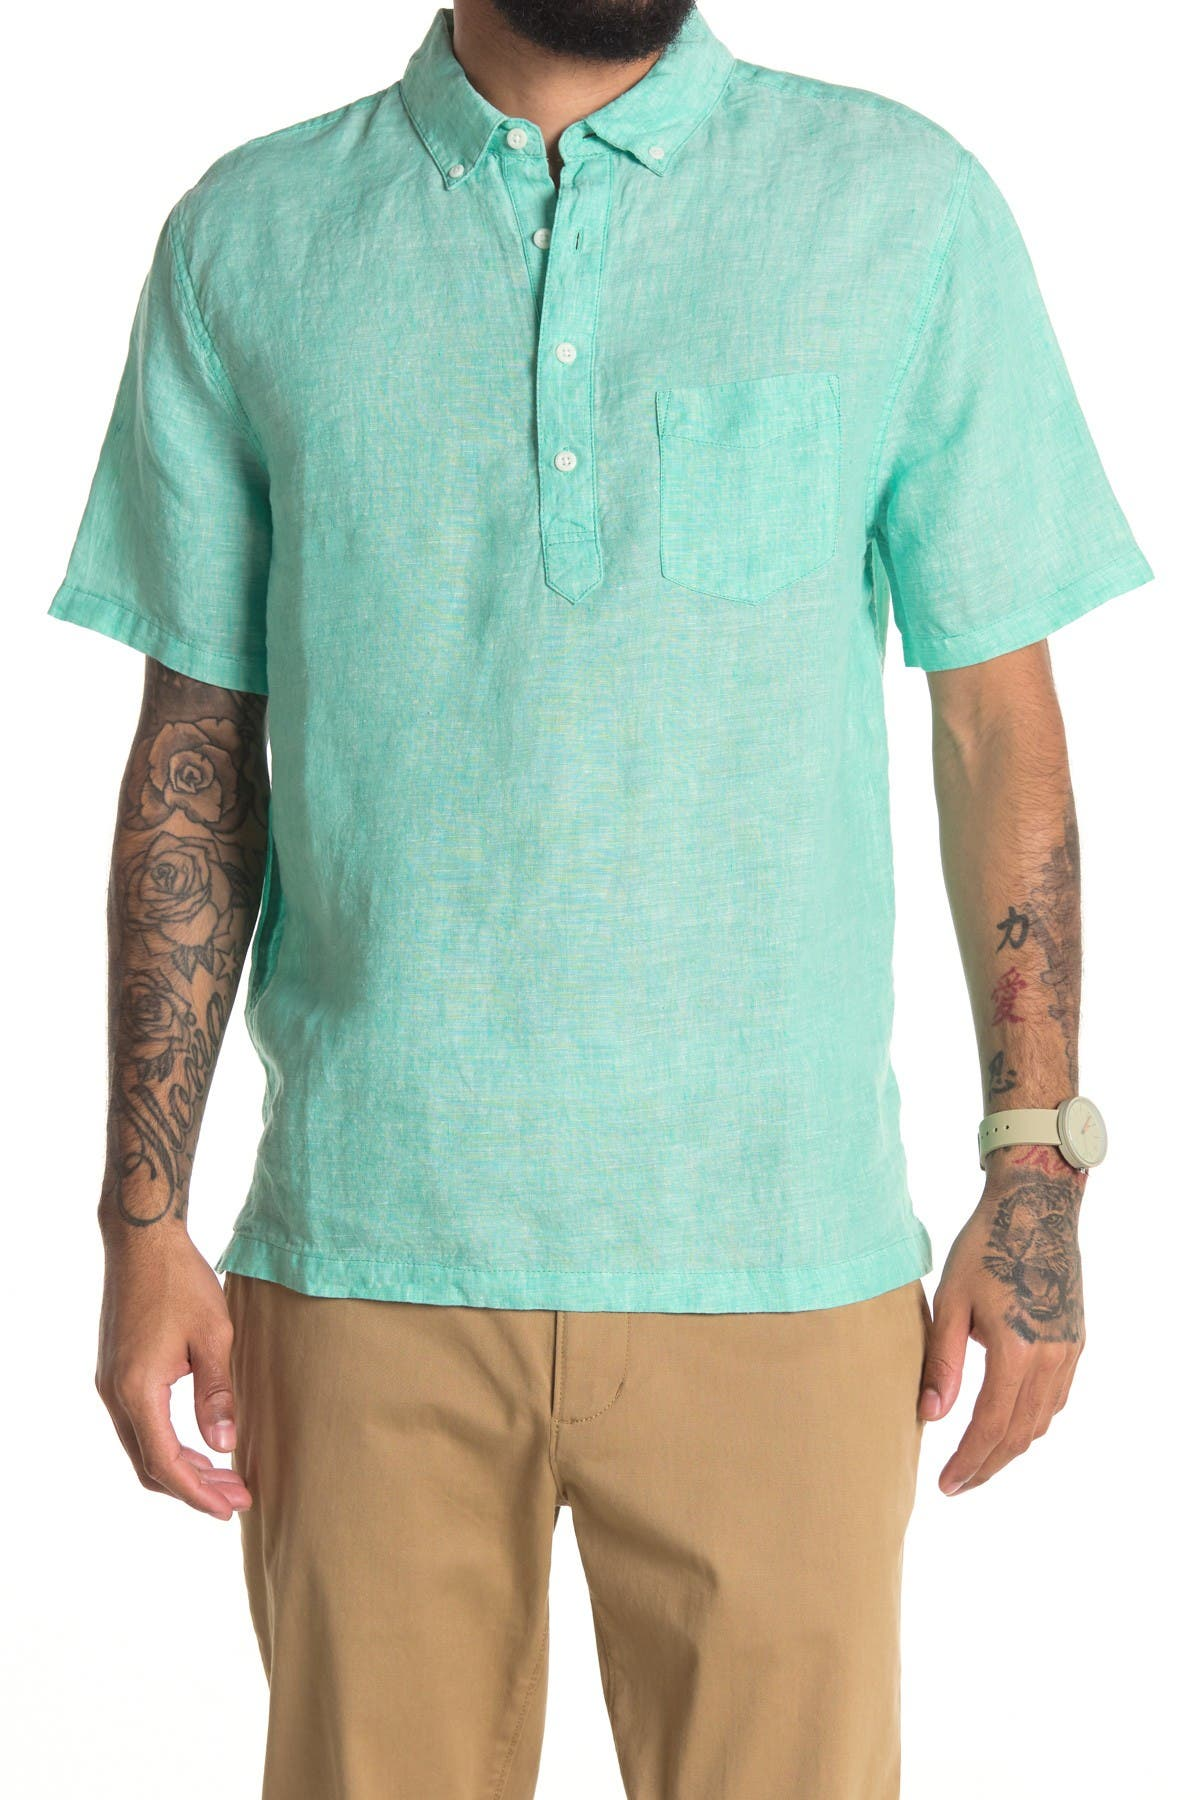 1950s Mens Shirts | Retro Bowling Shirts, Vintage Hawaiian Shirts Onia Josh Linen Partial Button Slim Fit Shirt Size XL - Bright Min at Nordstrom Rack $34.97 AT vintagedancer.com